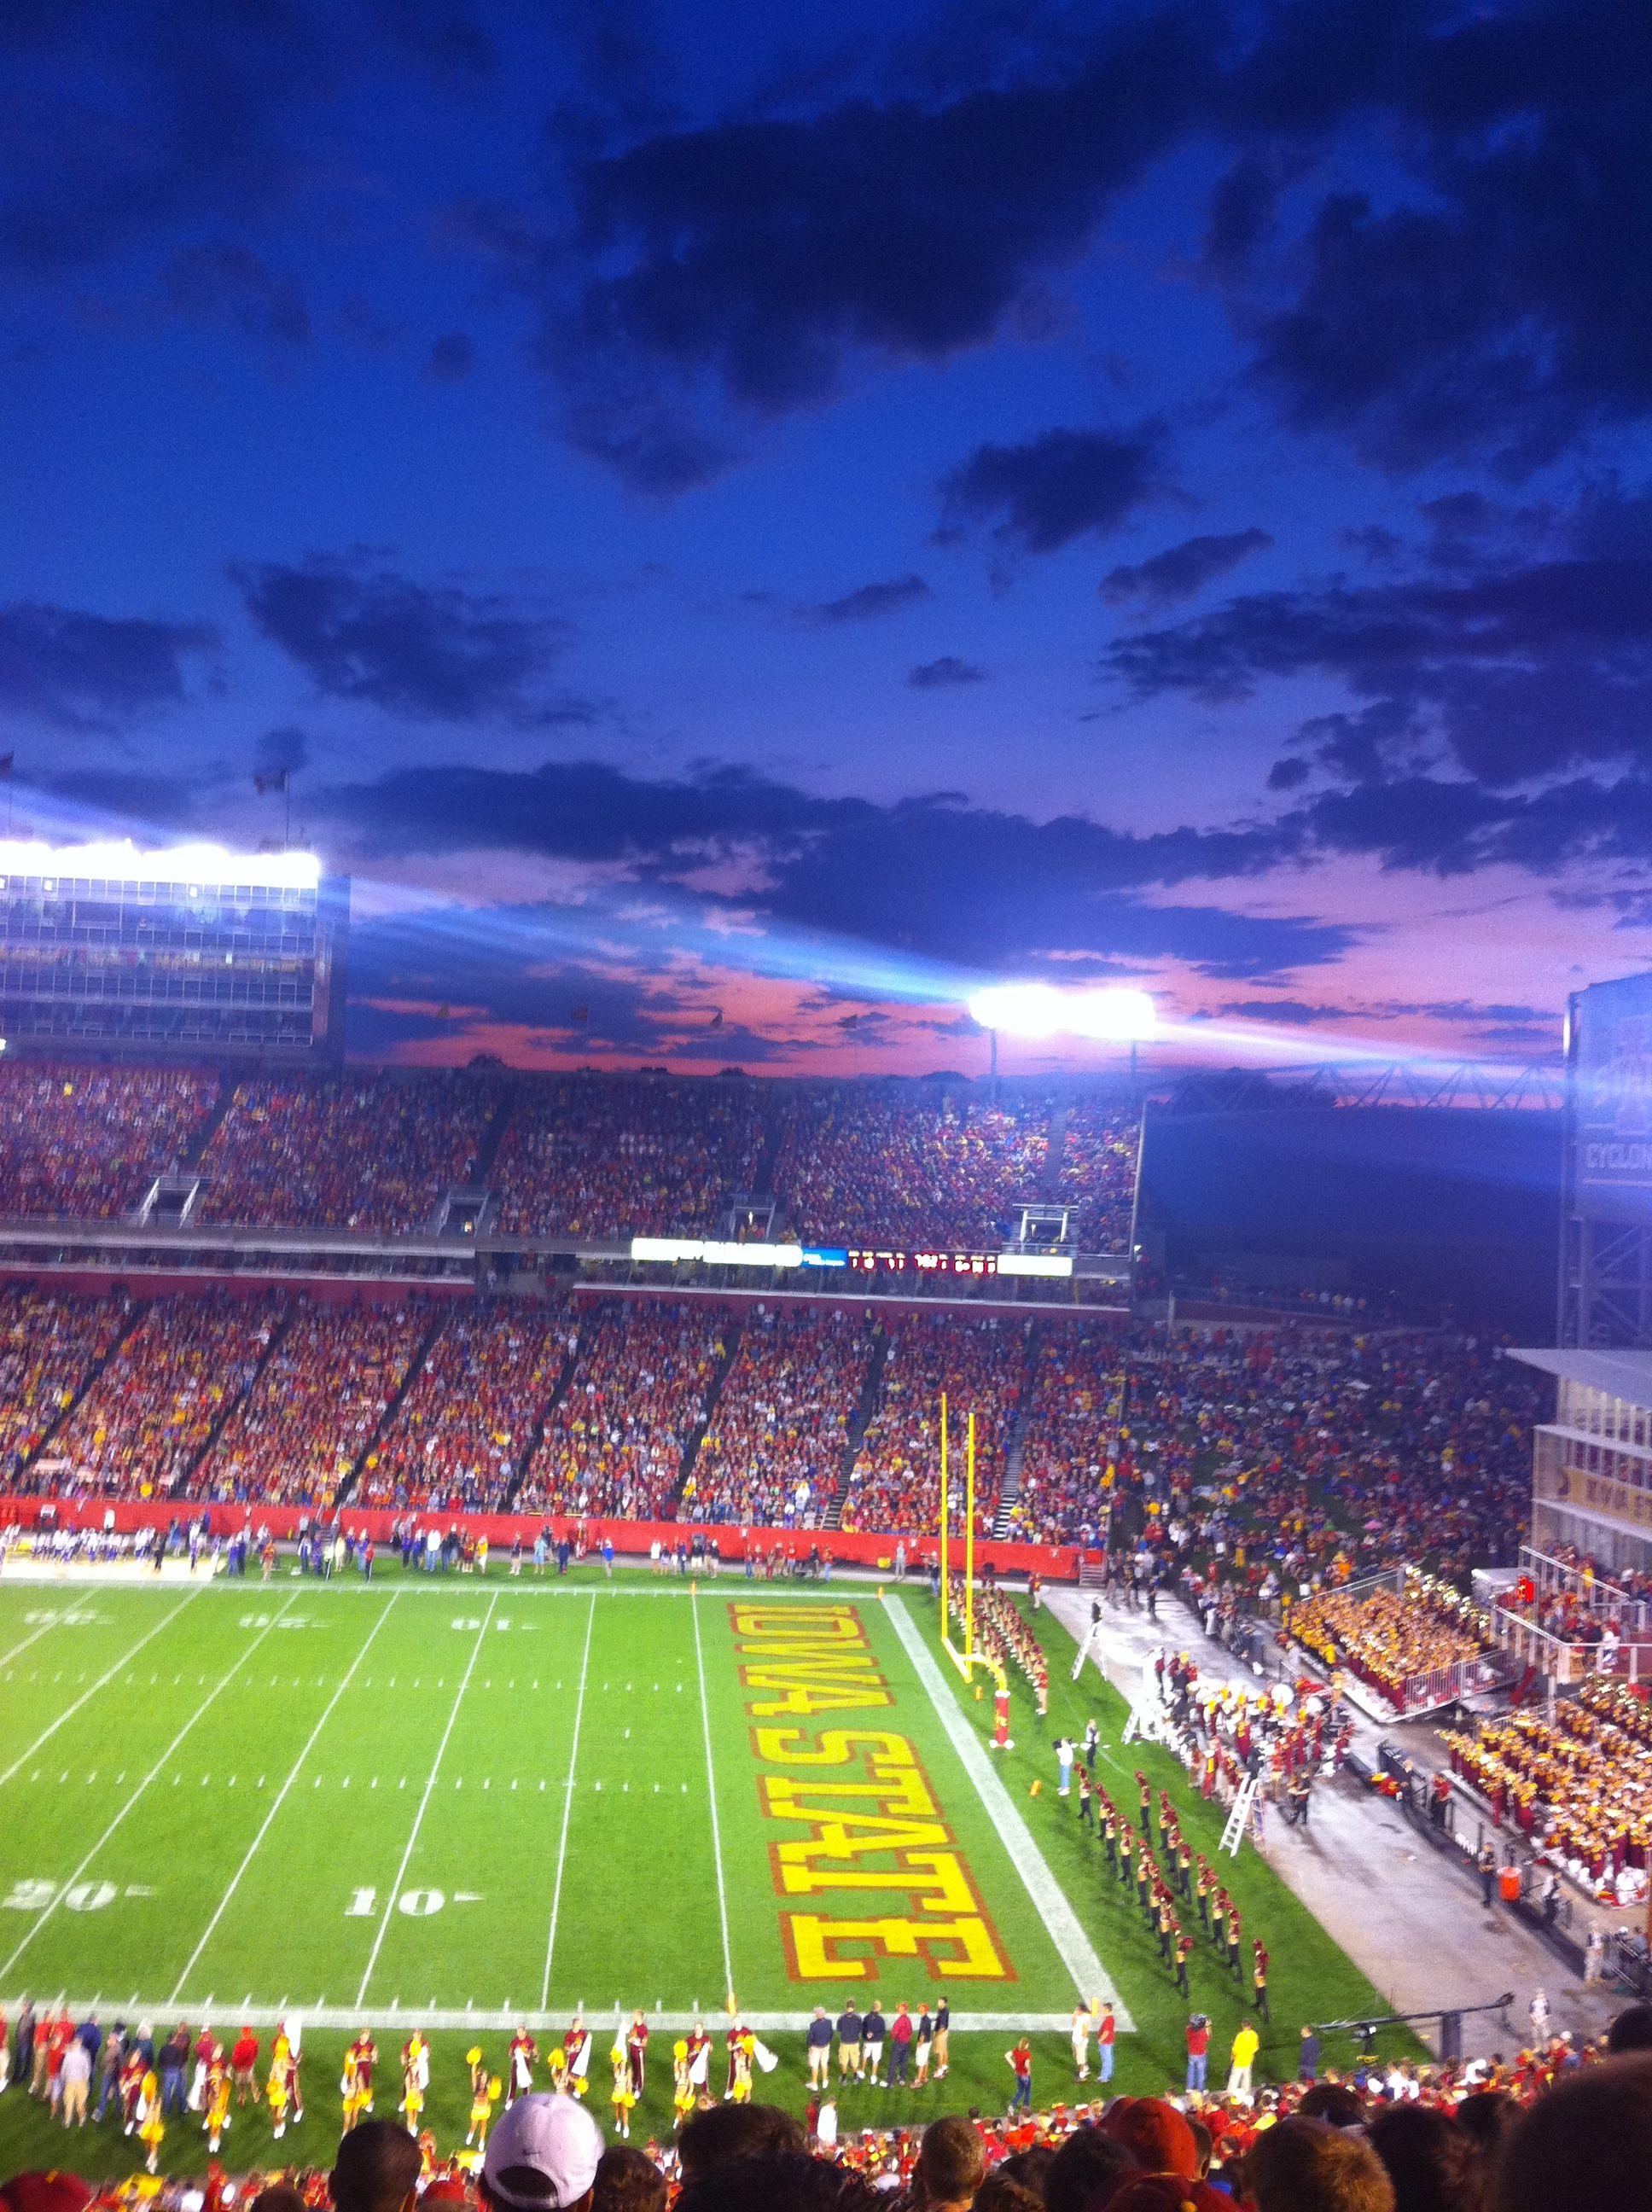 Great Photo Of Jack Trice Stadium Cyclonenation Iowa State Football Iowa State University Iowa State